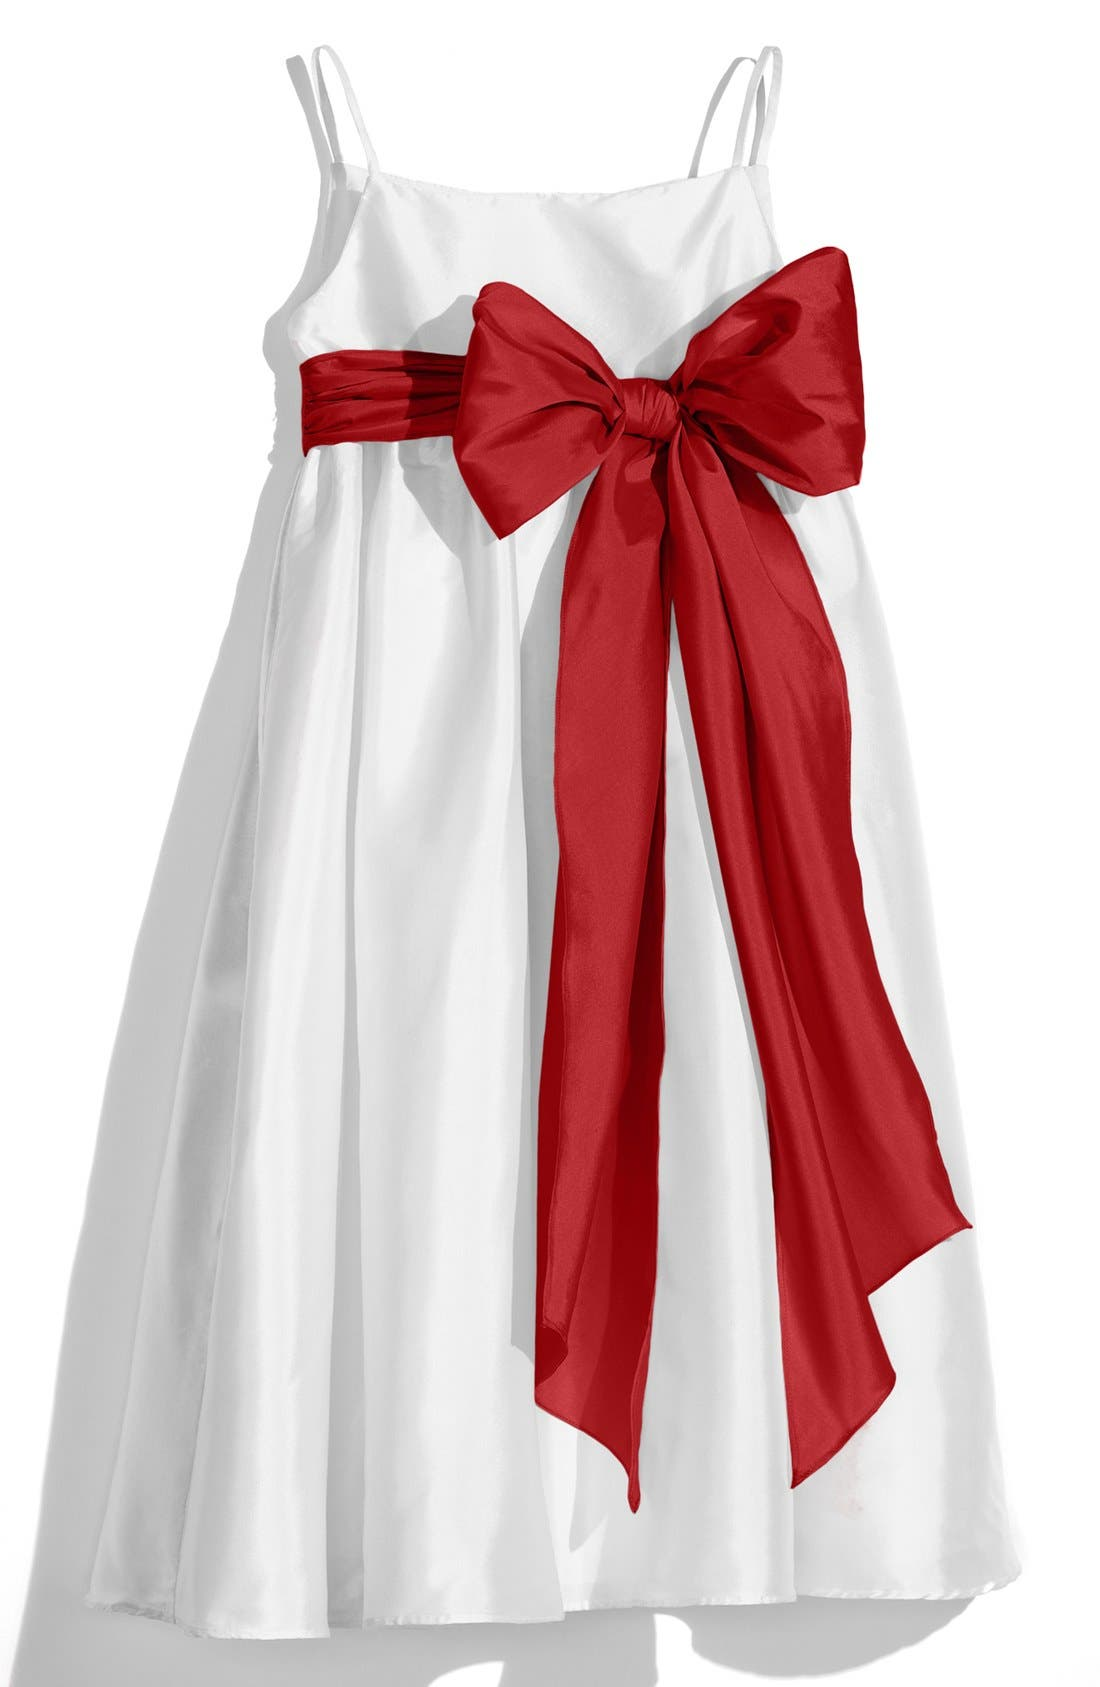 White Sleeveless Empire Waist Taffeta Dress,                         Main,                         color, White/ Rouge